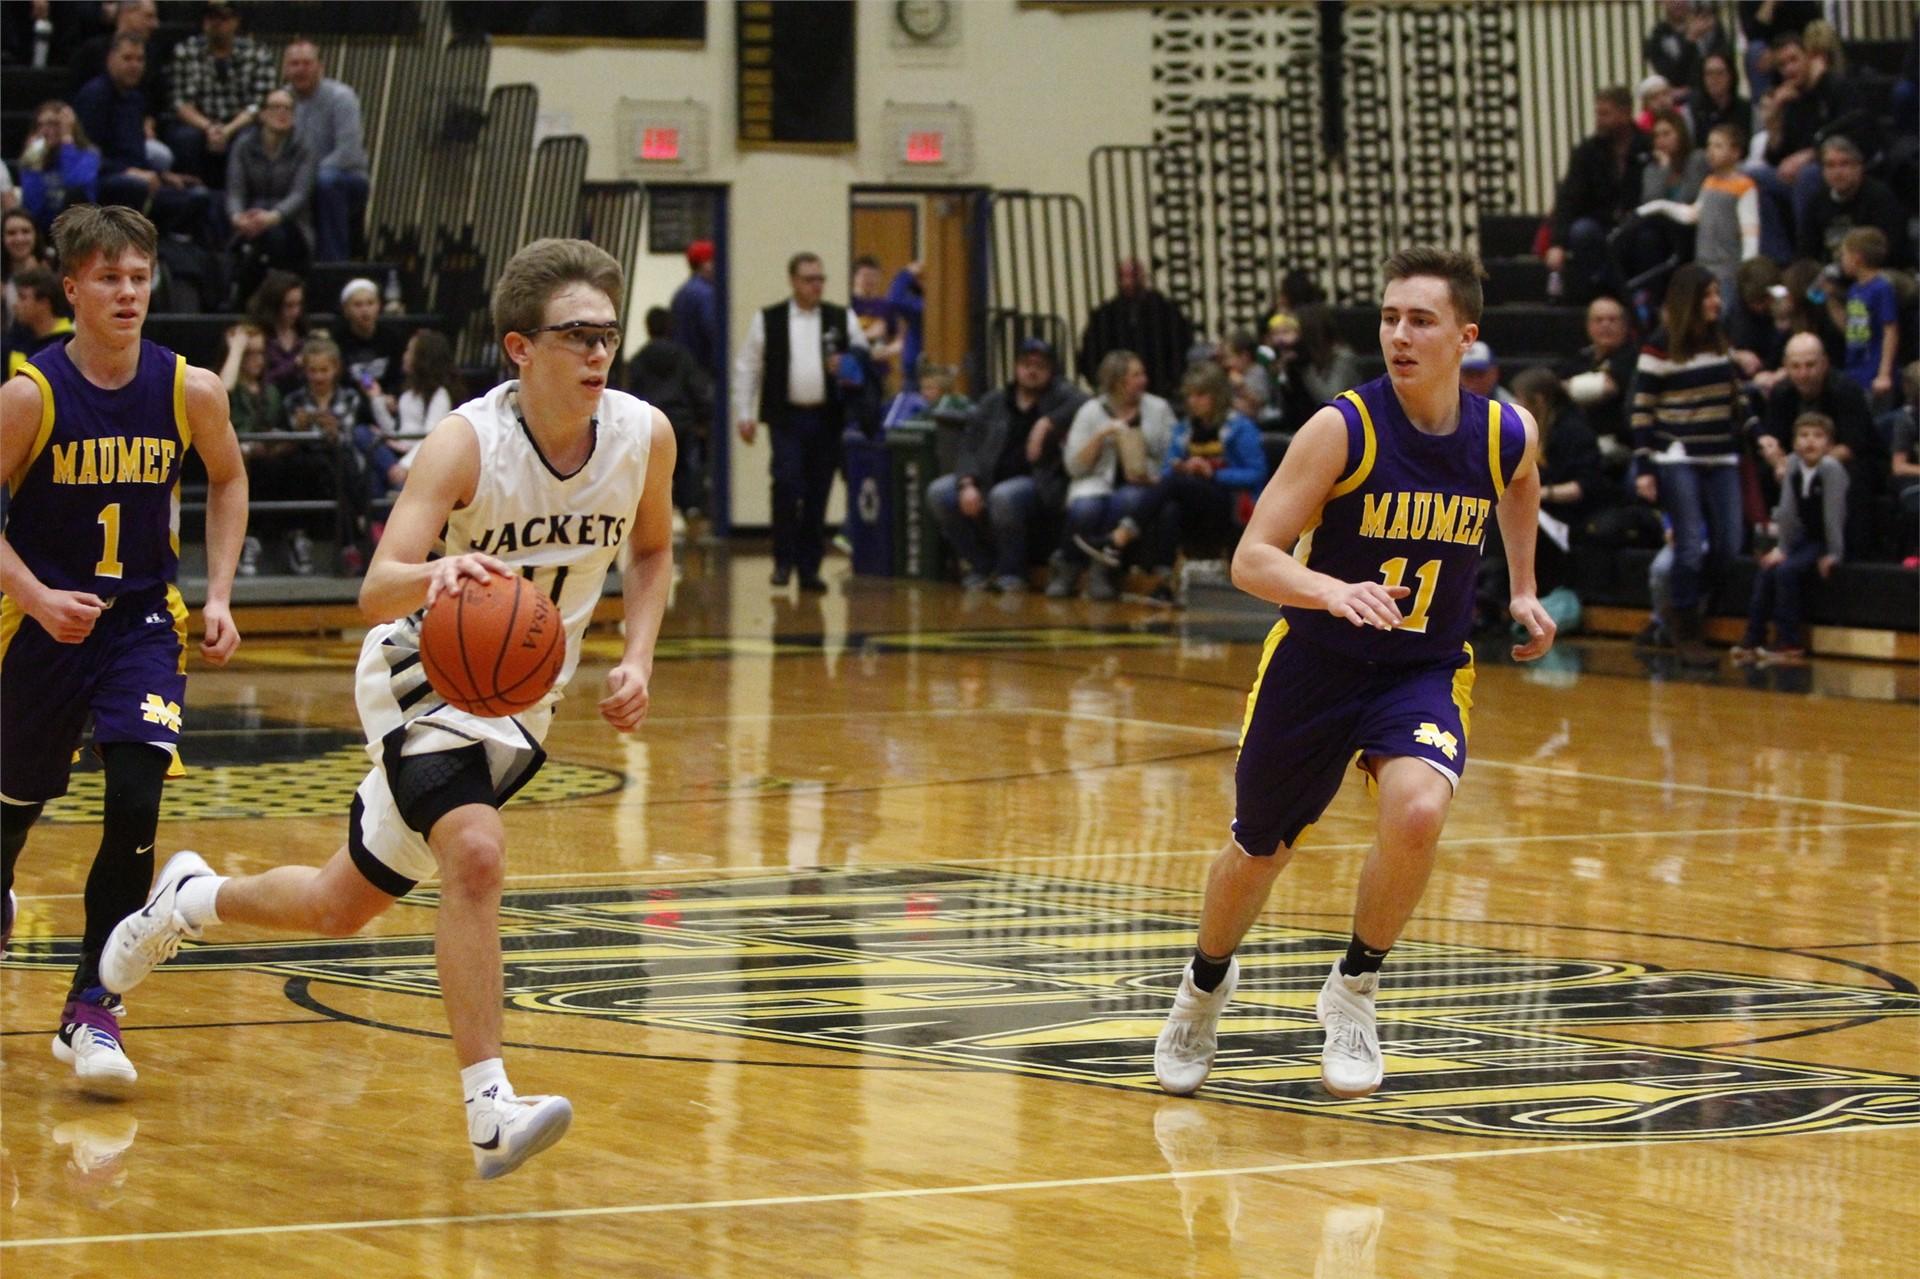 PHS student athlete dribbling a basketball